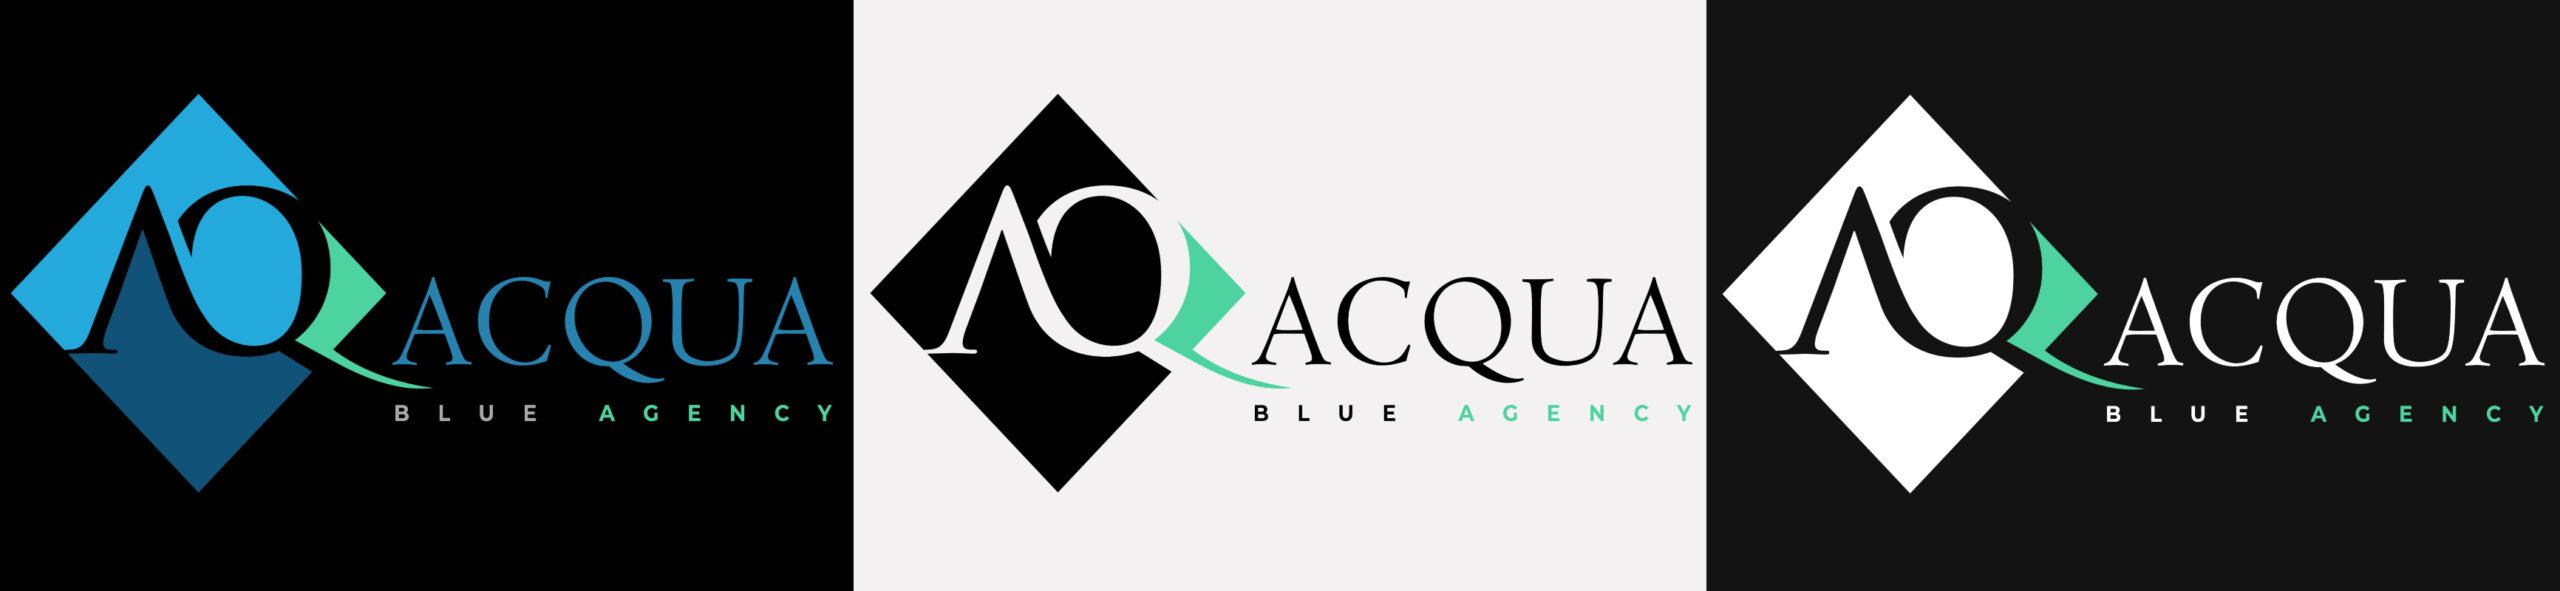 acqua-blue-agency-logo-variants